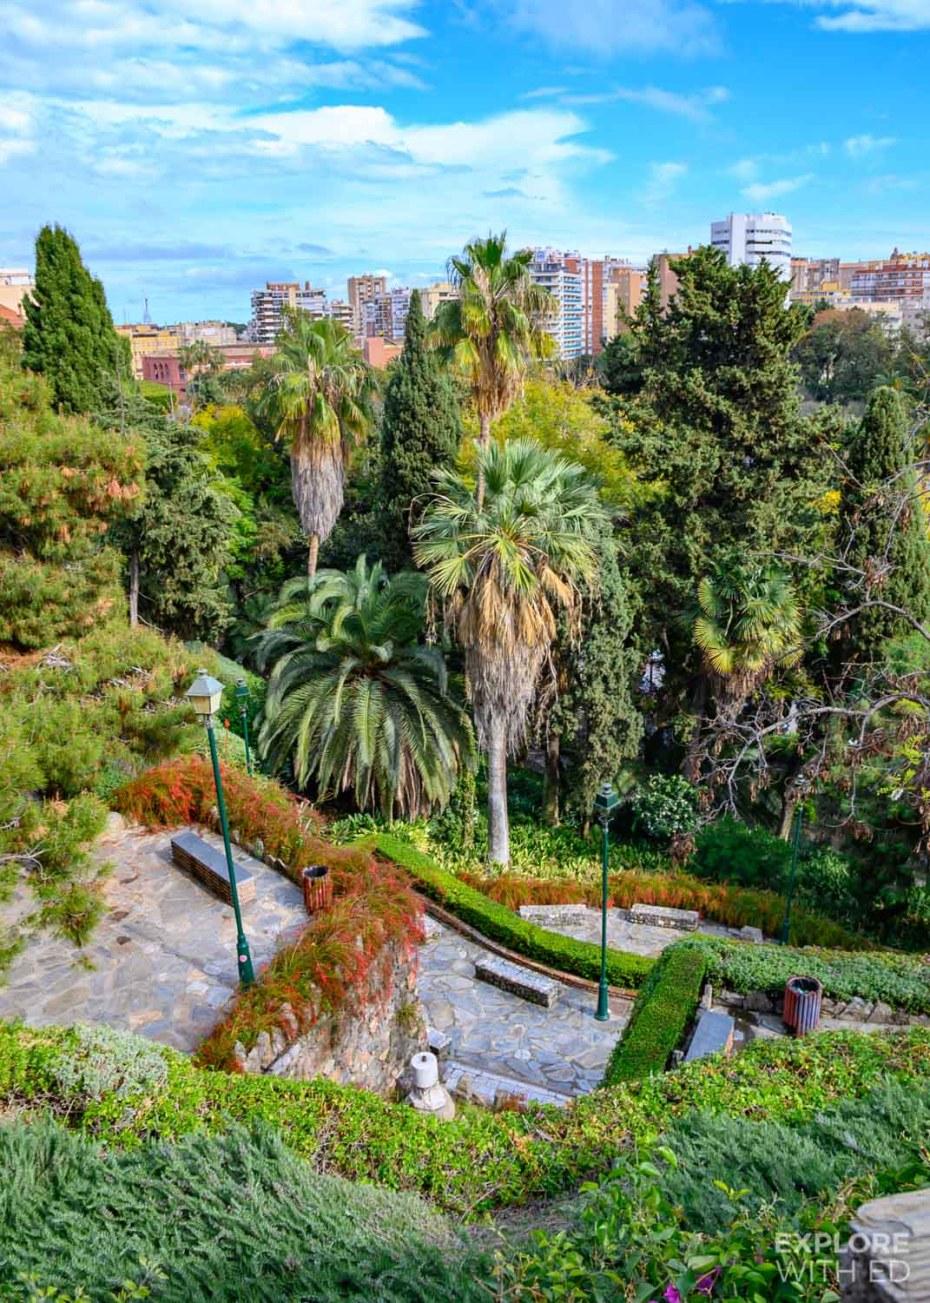 Parks and gardens of Malaga leading up to Gibralfaro